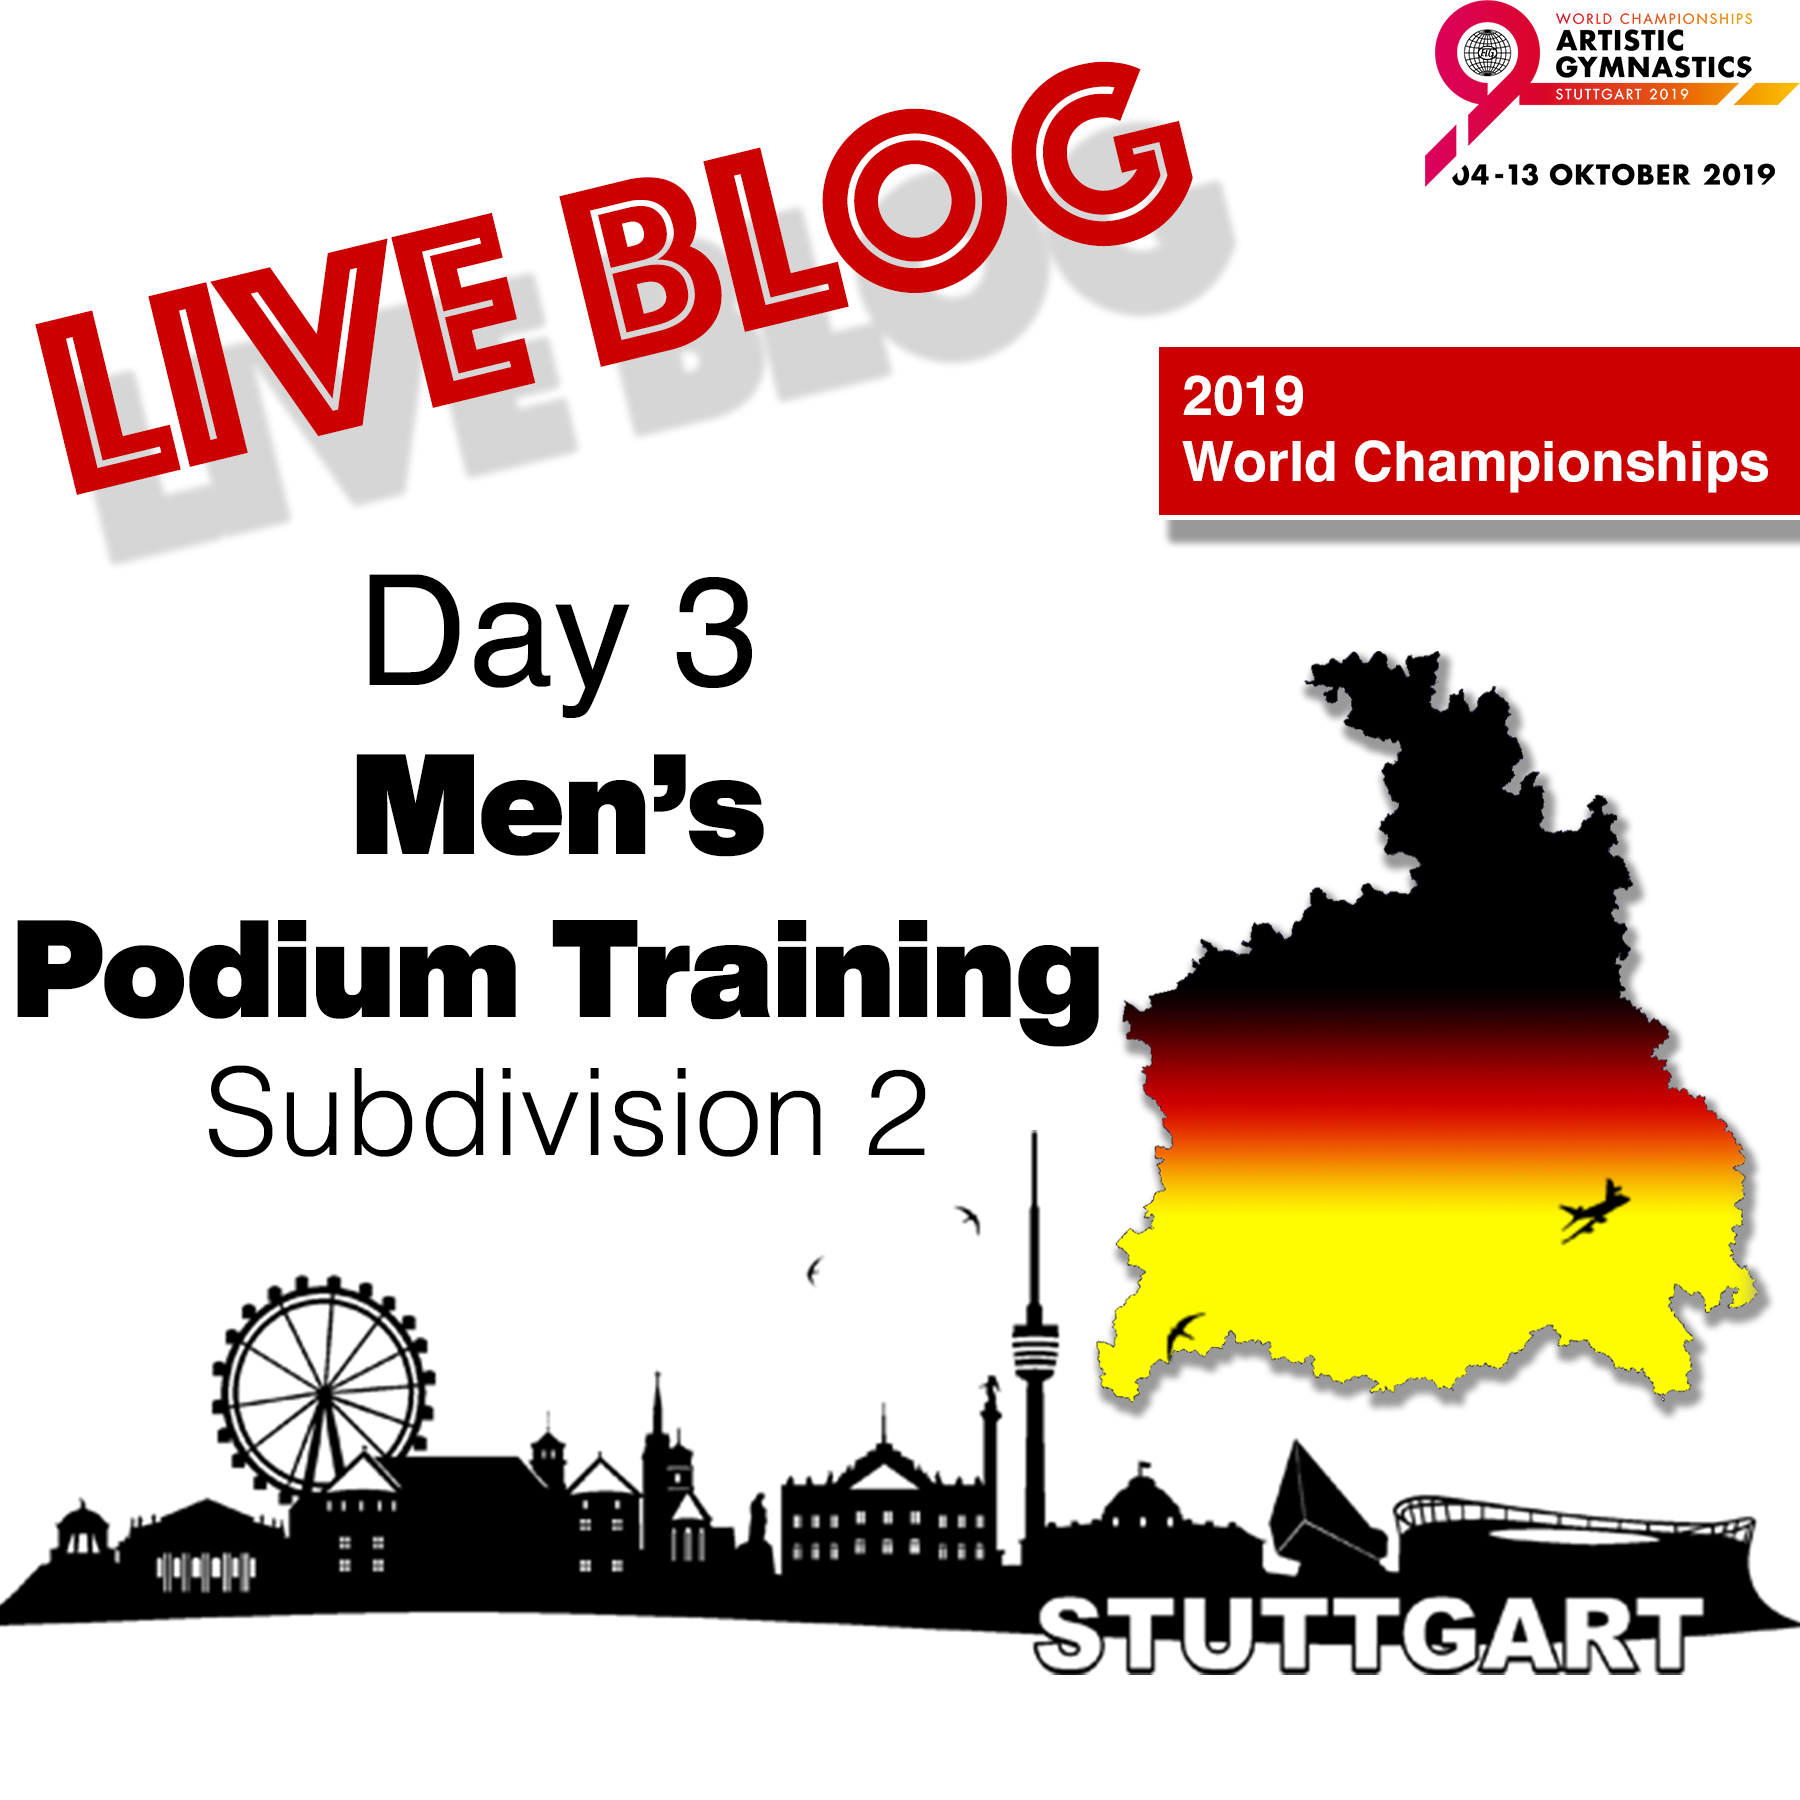 Live Blog: 2019 World Championships – MAG Podium Training – Sub Division 2, Oct. 2nd